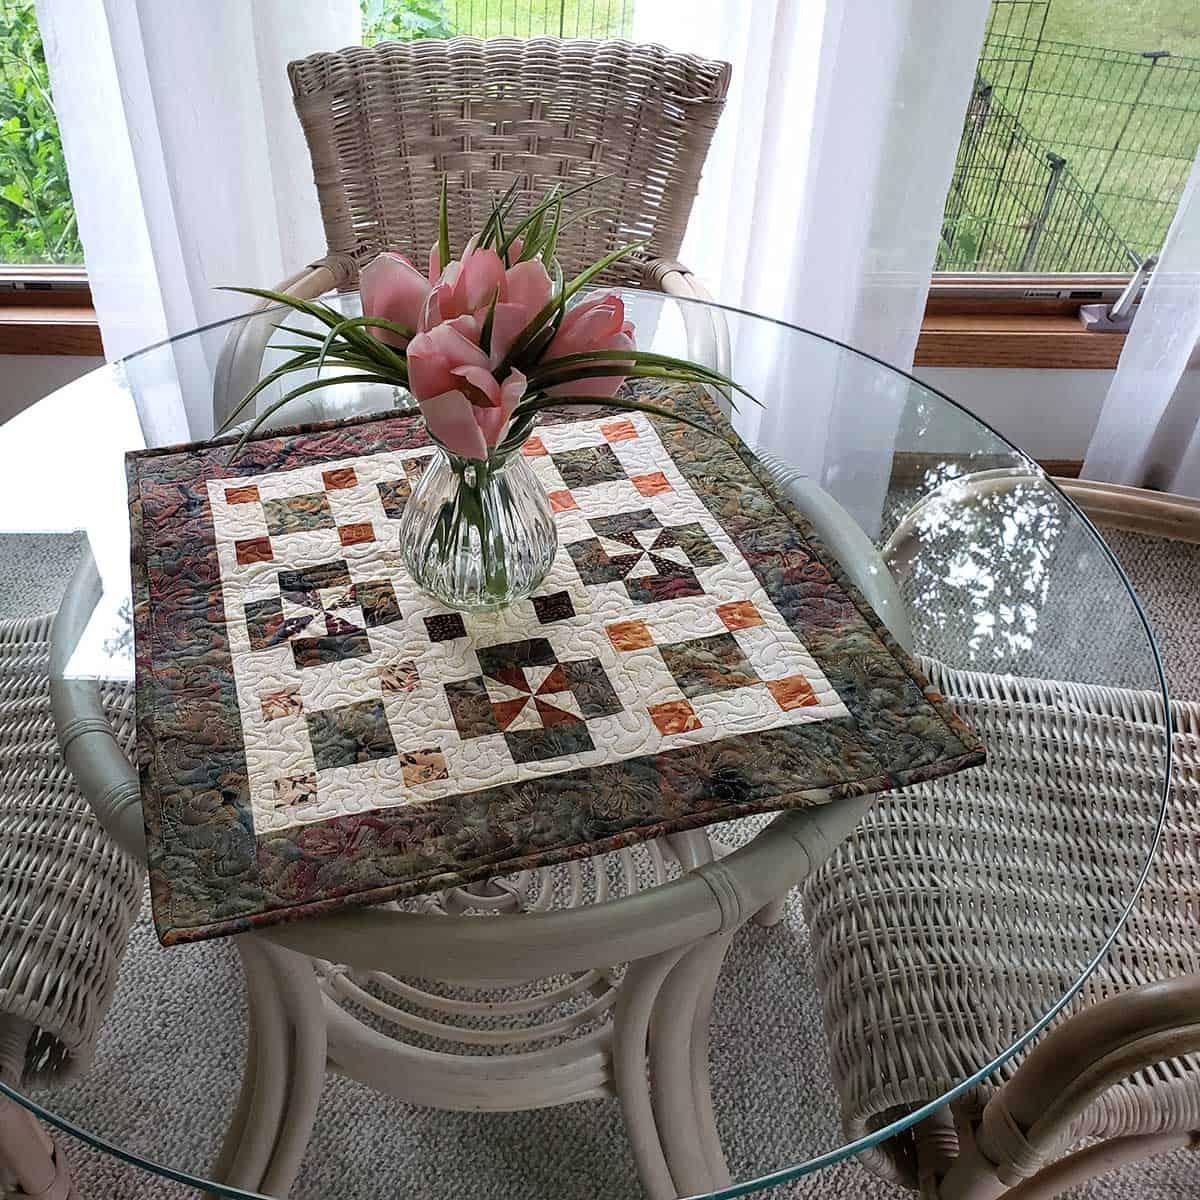 Qurtis mini quilt on table